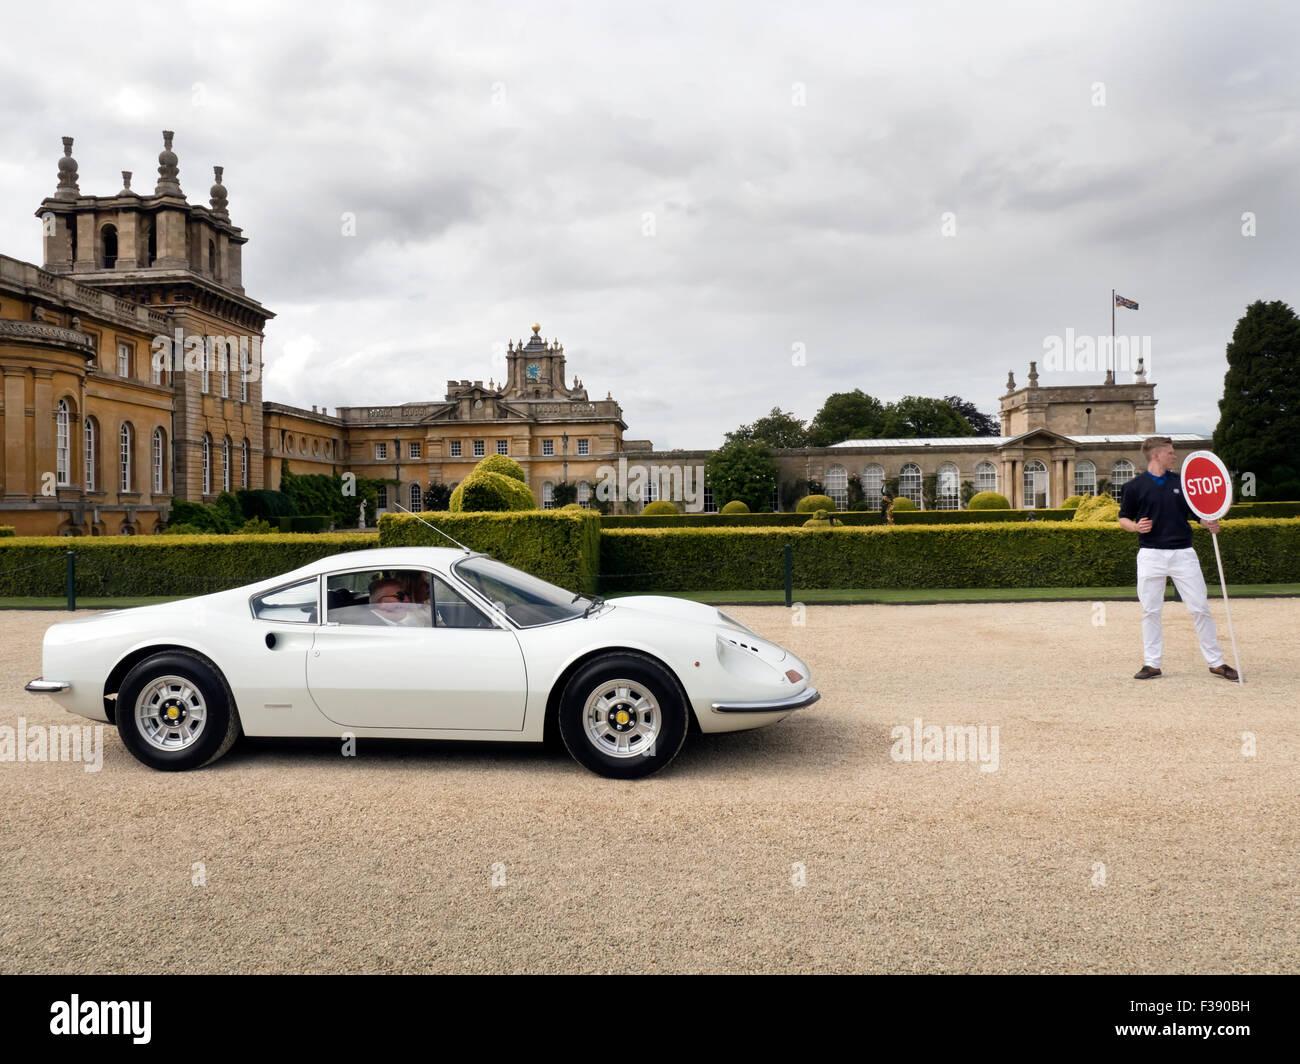 1972 Ferrari Dino at Salon Prive auto show 2015 Blenheim Palace - Stock Image